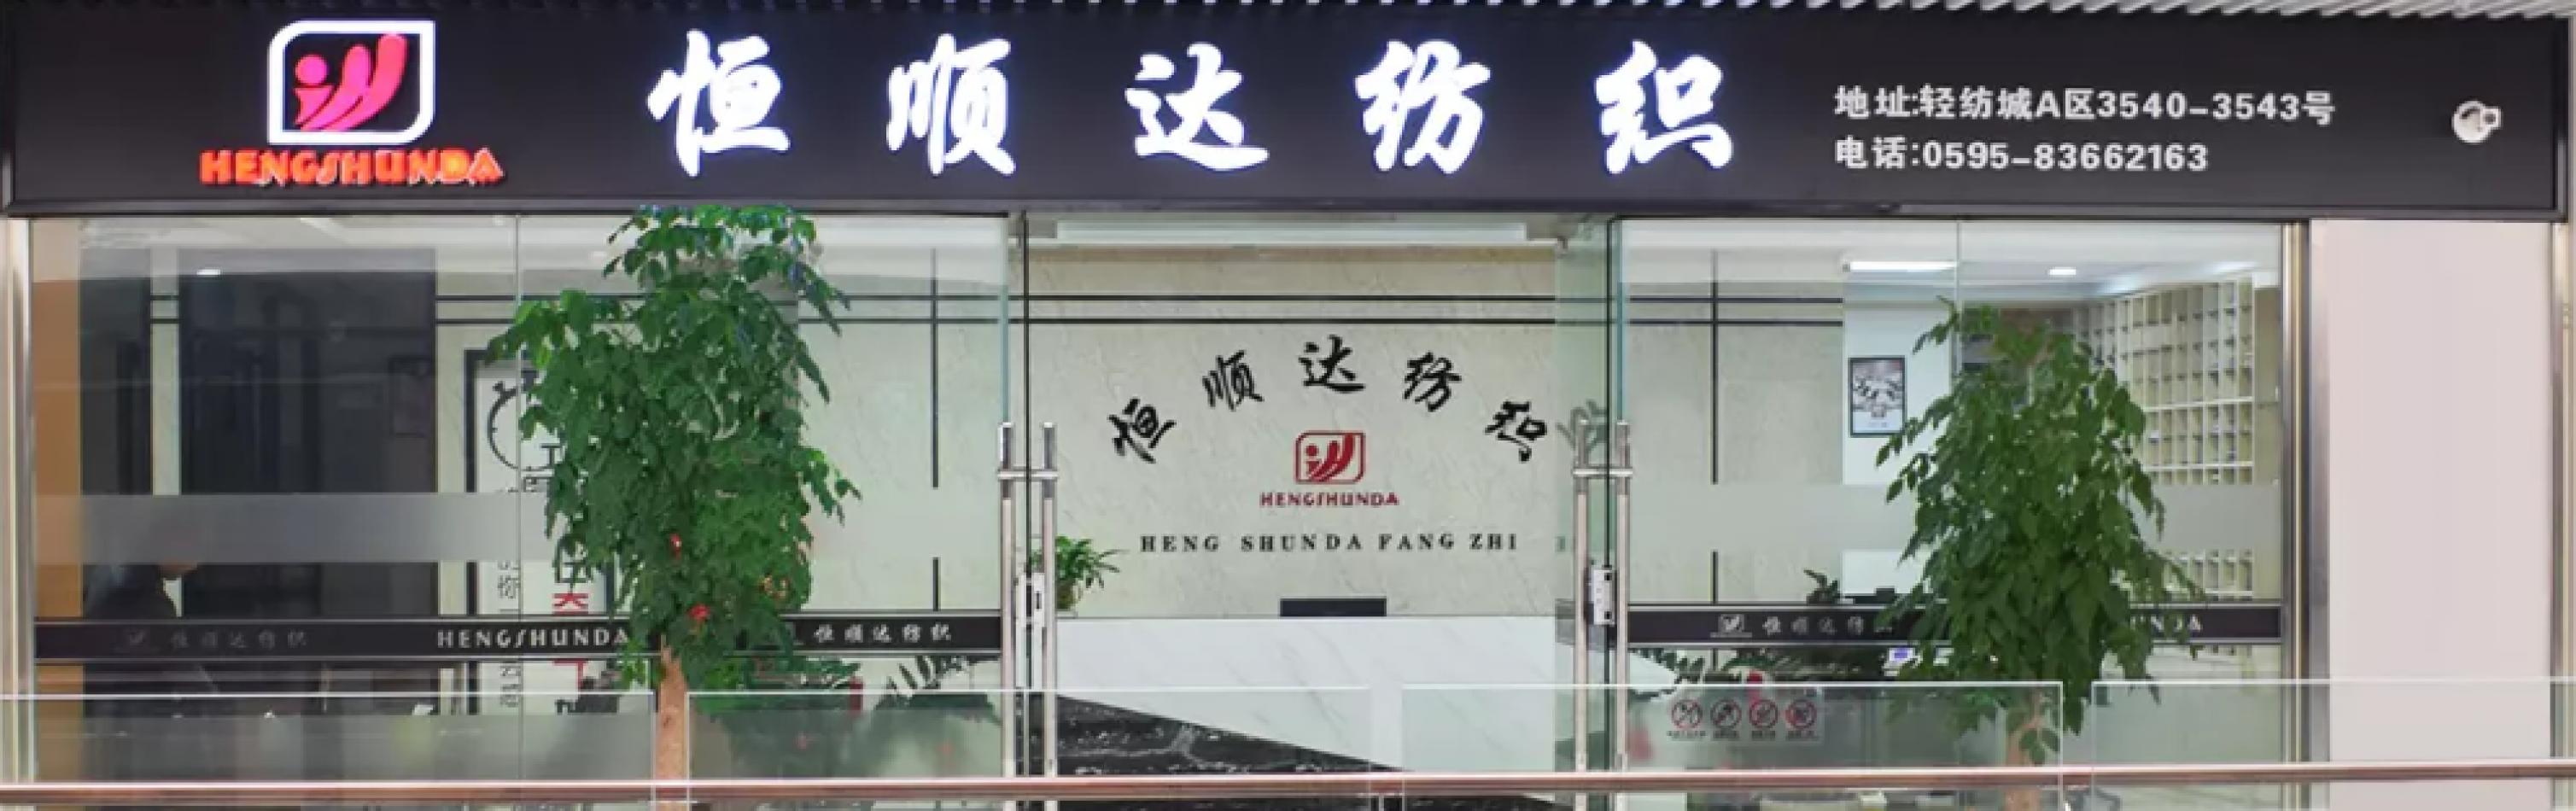 Xiamen Wanshicheng Imp & Exp Co., Ltd.